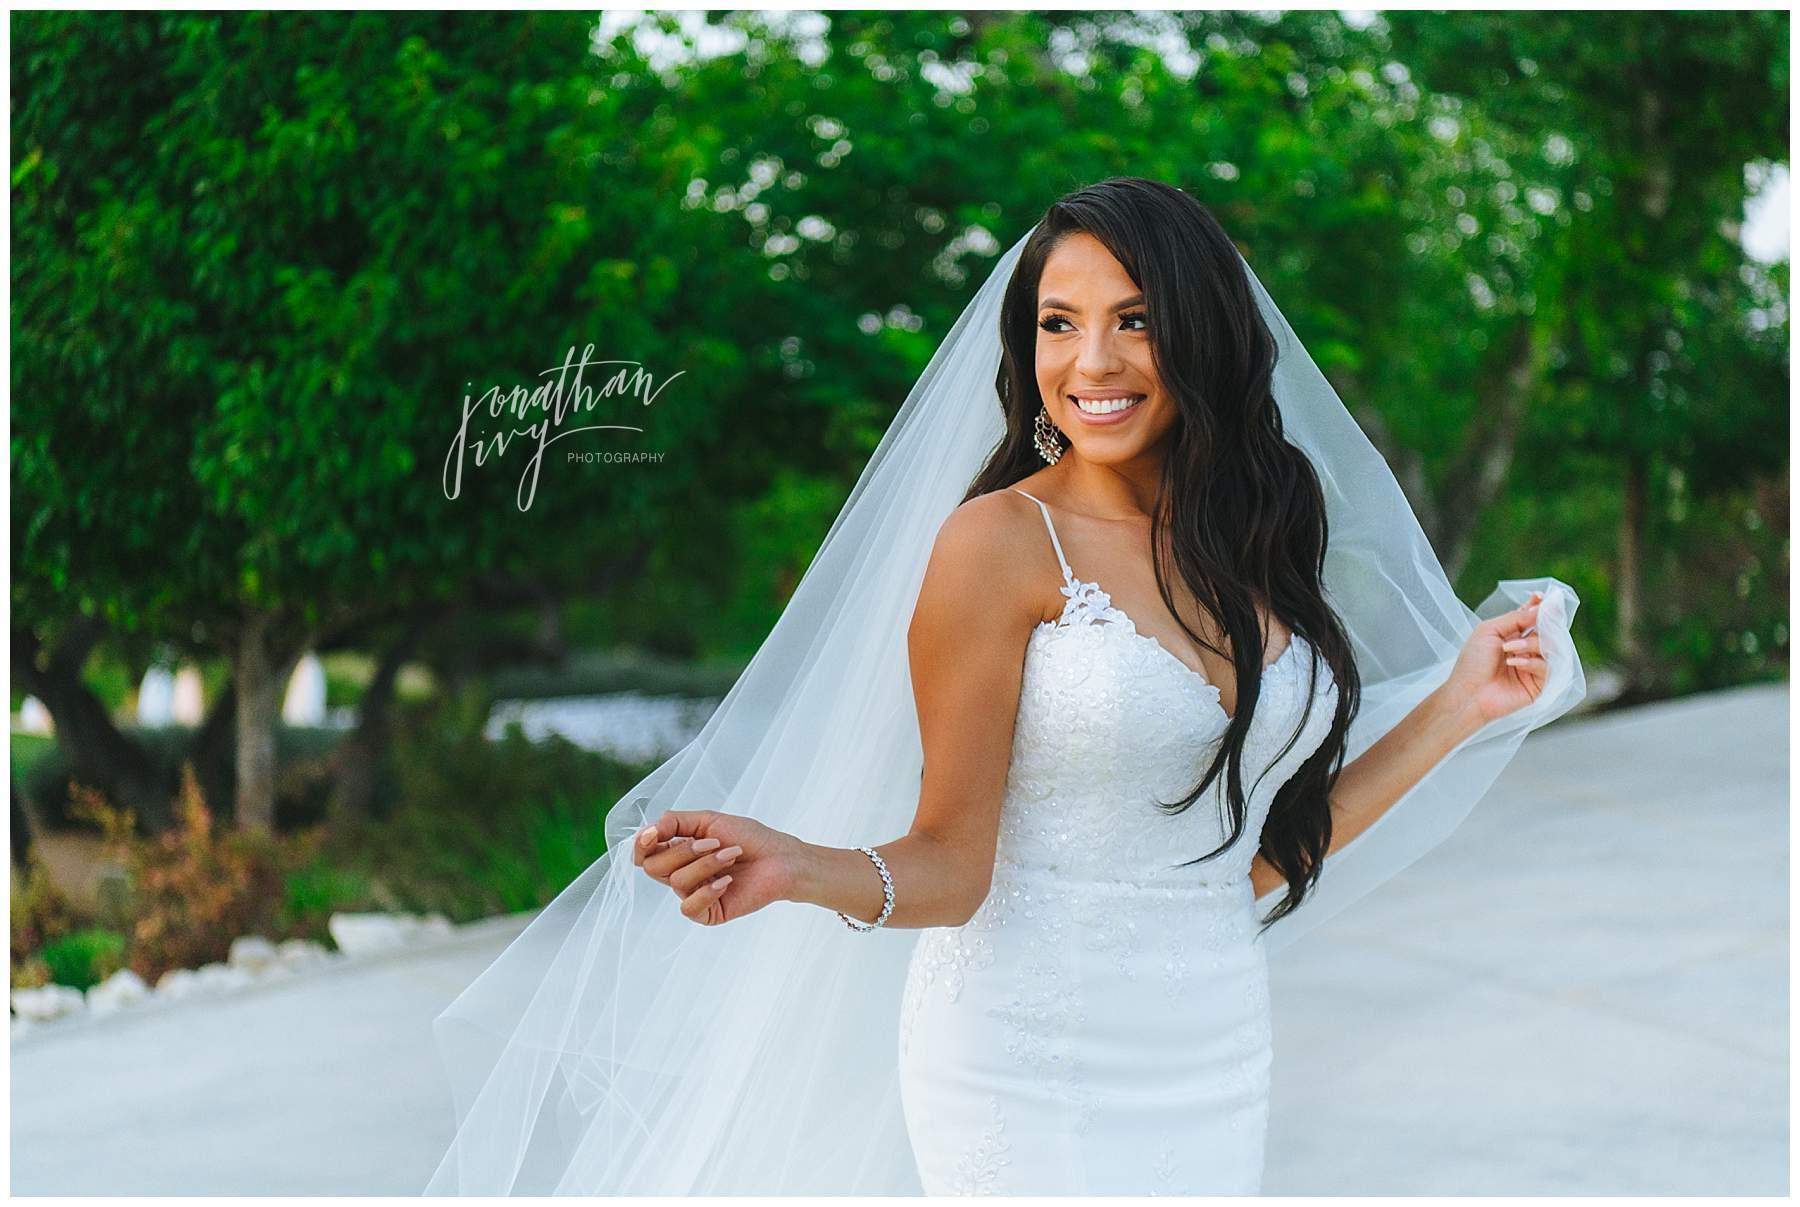 San Antonio Bridal – Kendall Plantation Bridal